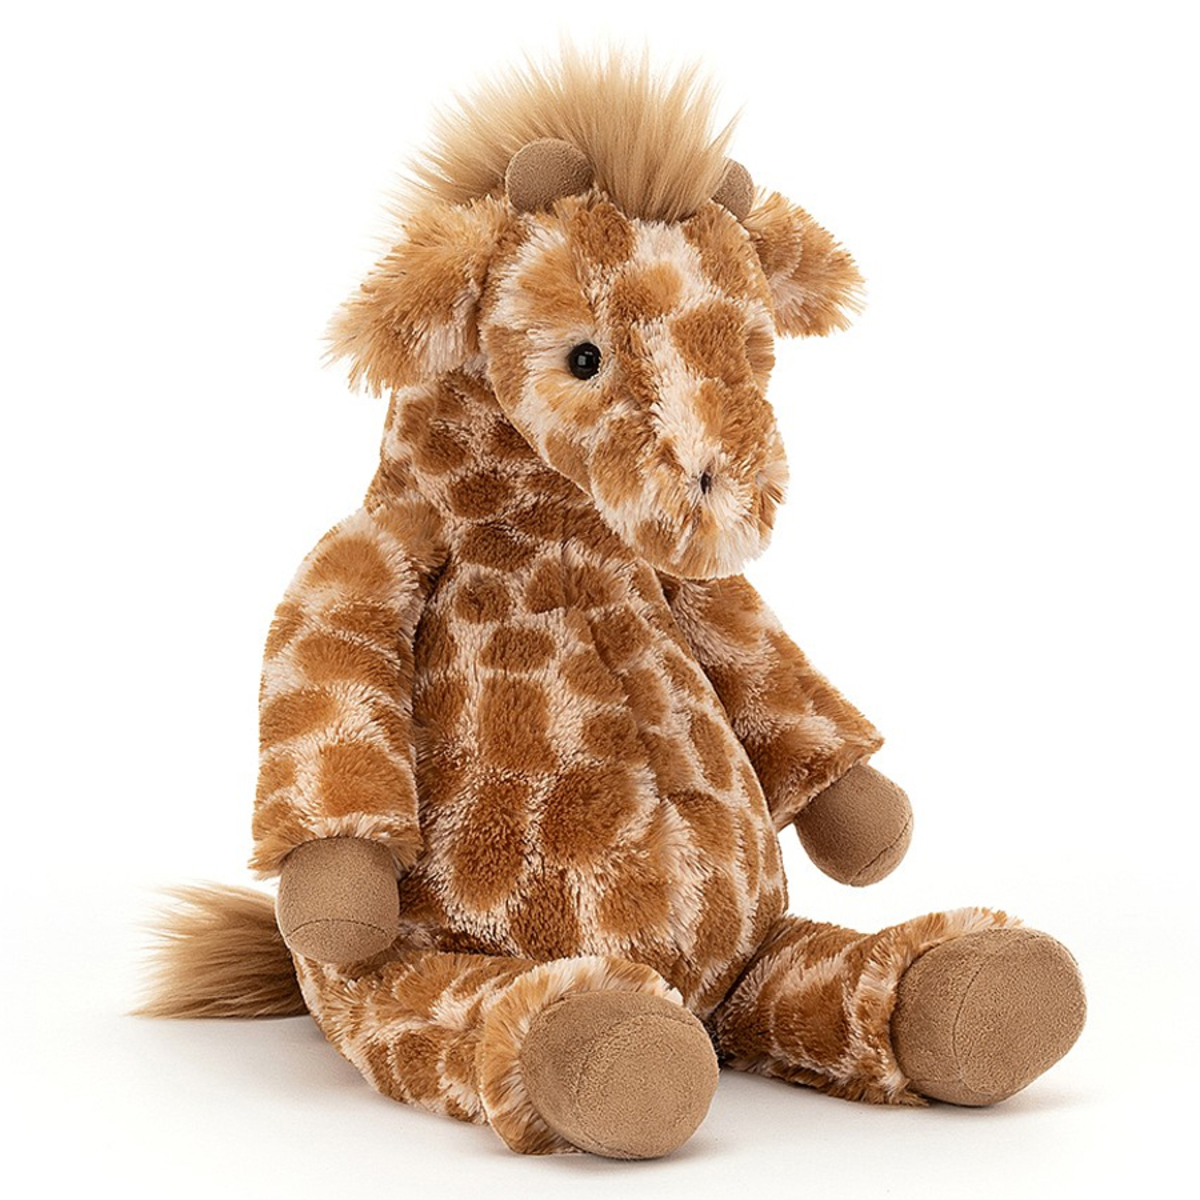 Peluche Lallagie Giraffe Peluche Girafe 39 cm